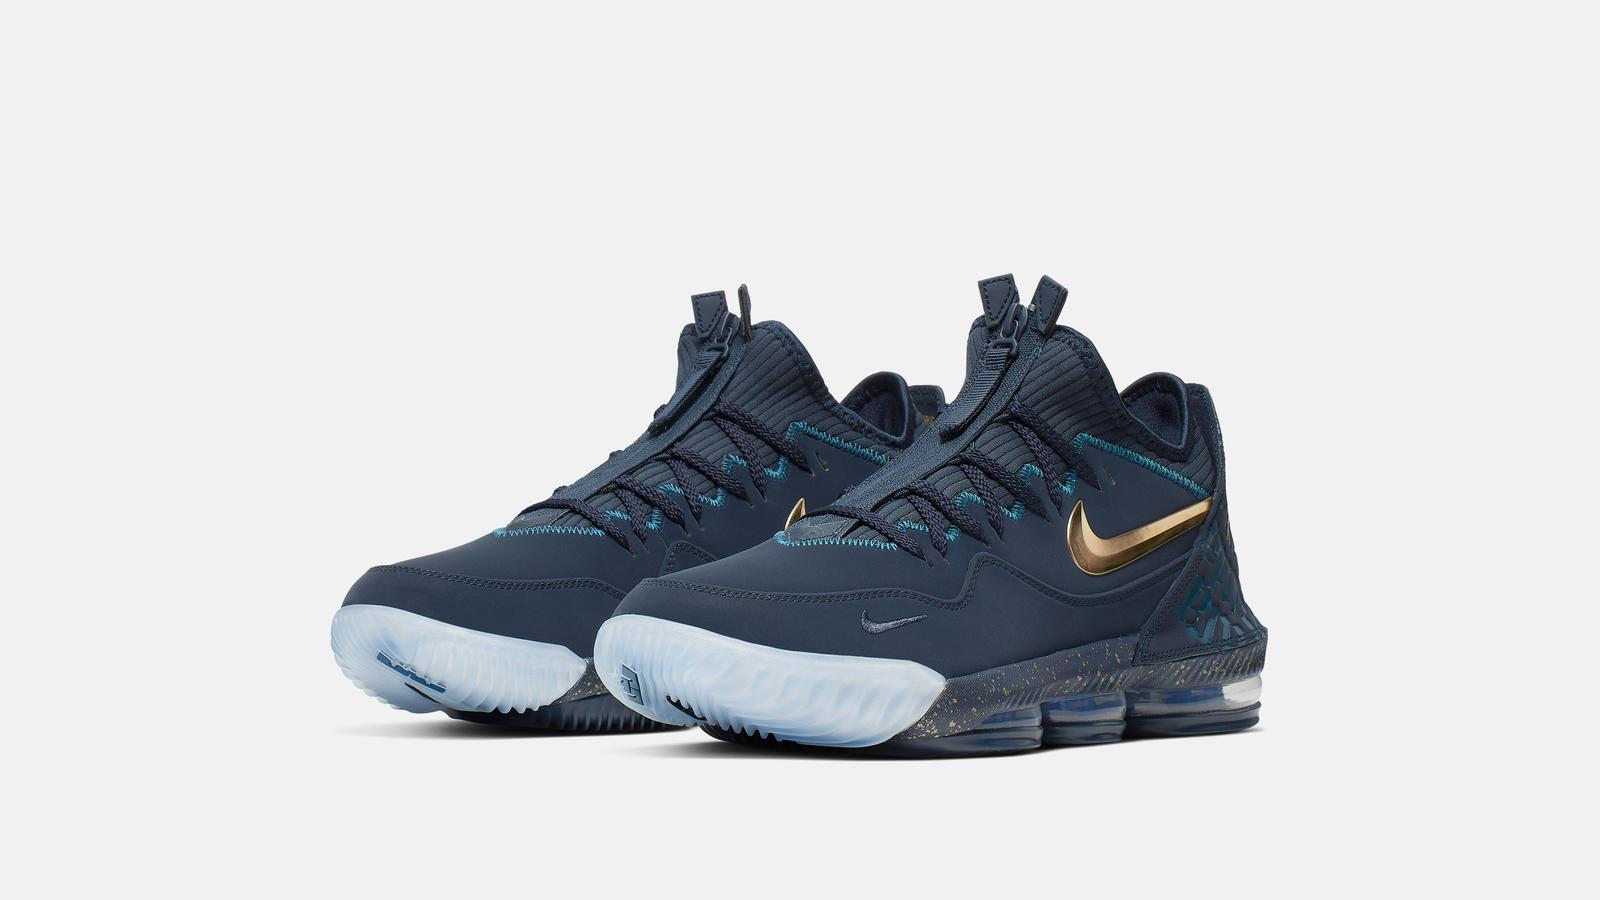 Nike LeBron 16 Low 'Agimat'August 31, 2019